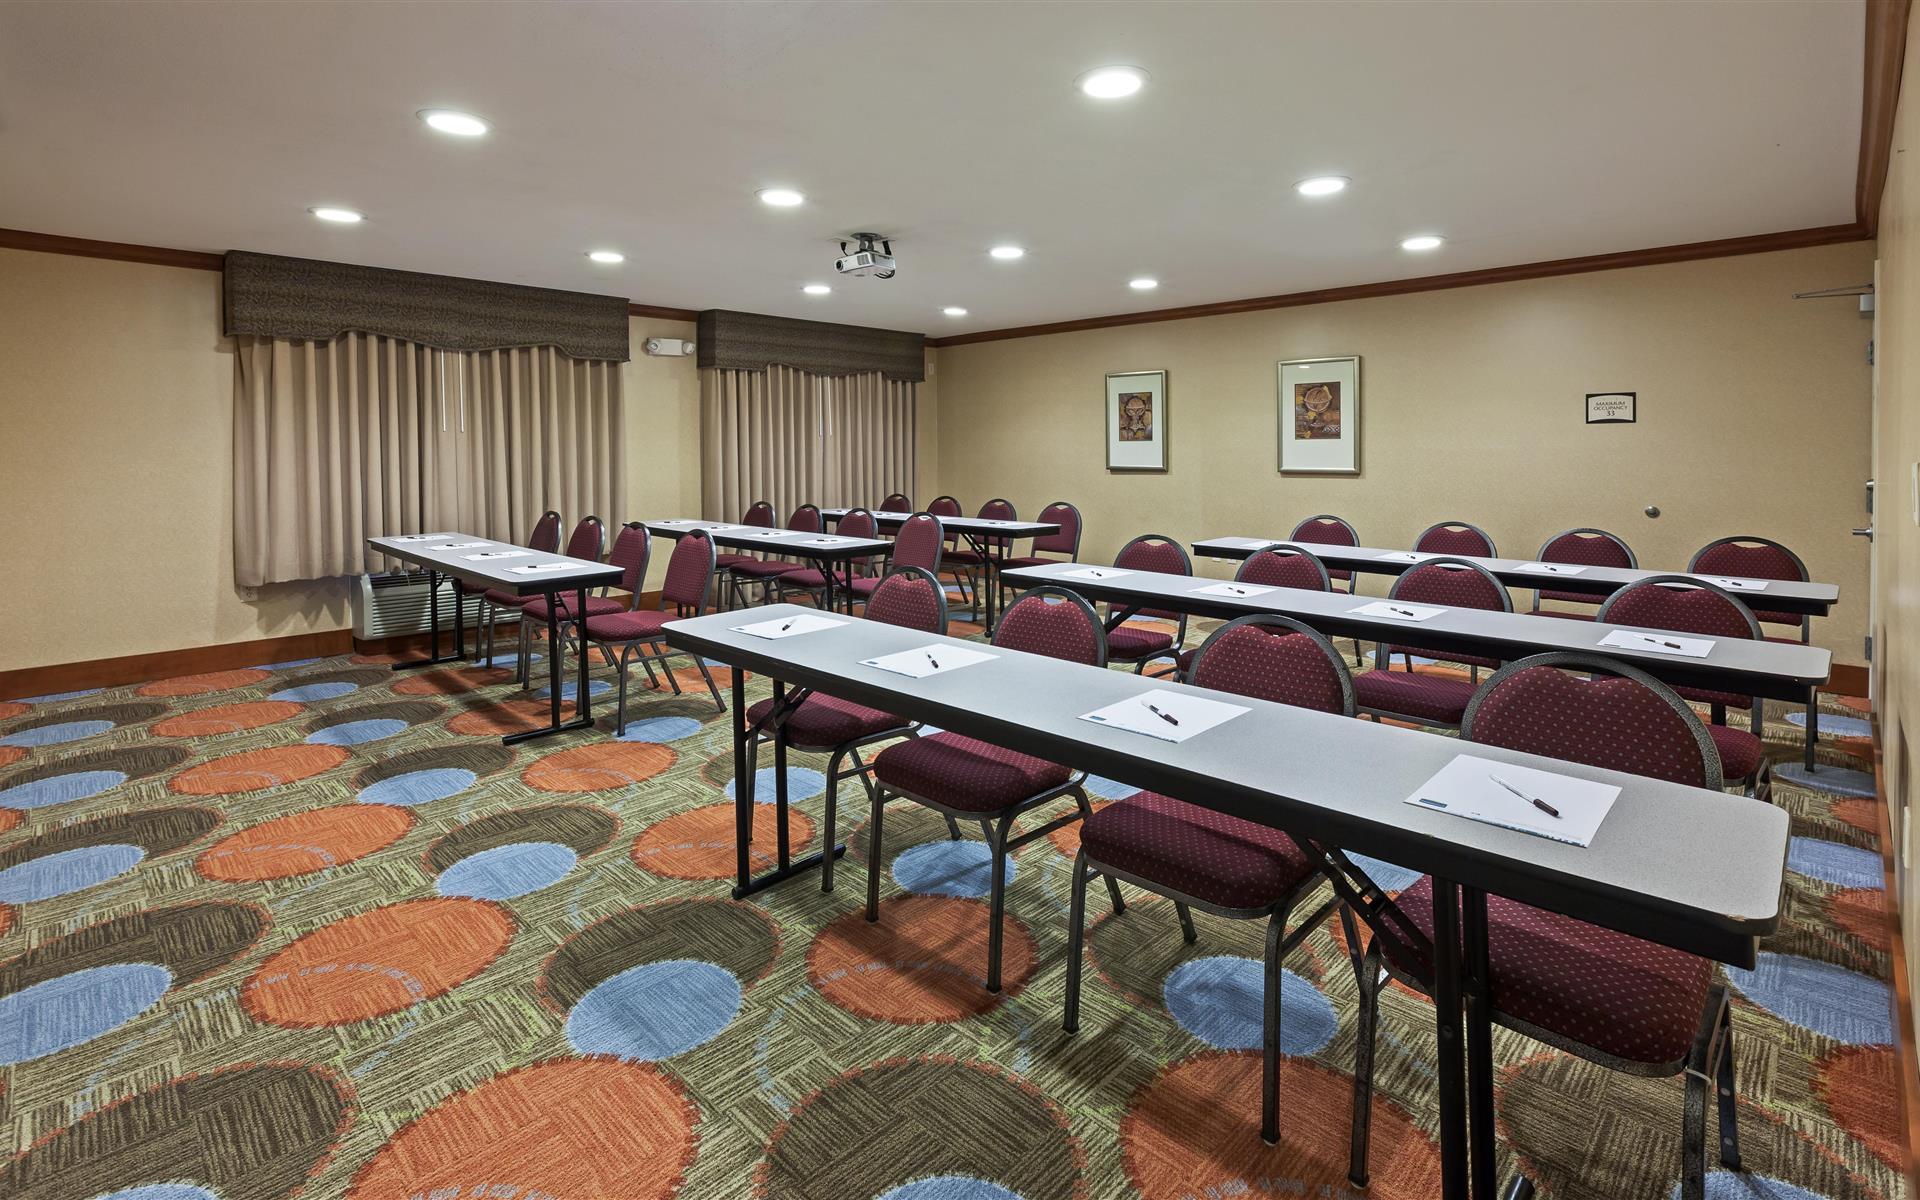 Staybridge Suites NW near Six Flags - The Alamo Room